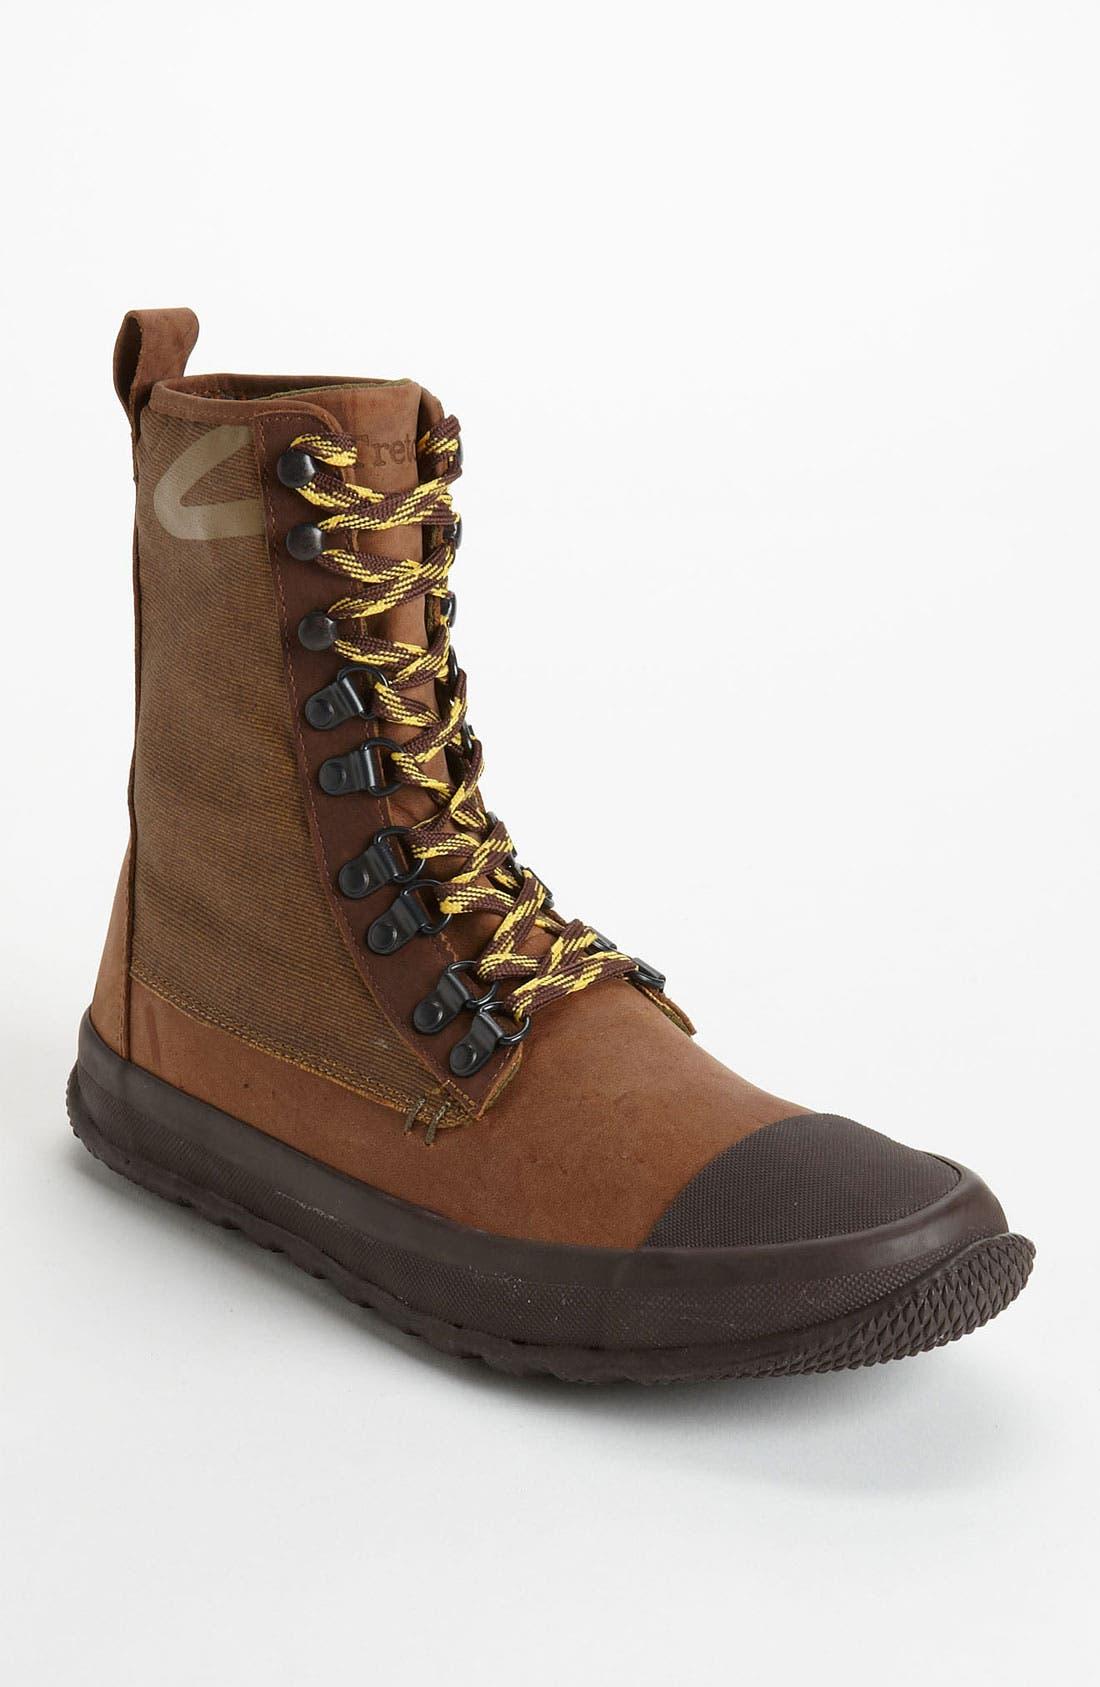 Main Image - Tretorn 'Klipporone' Boot